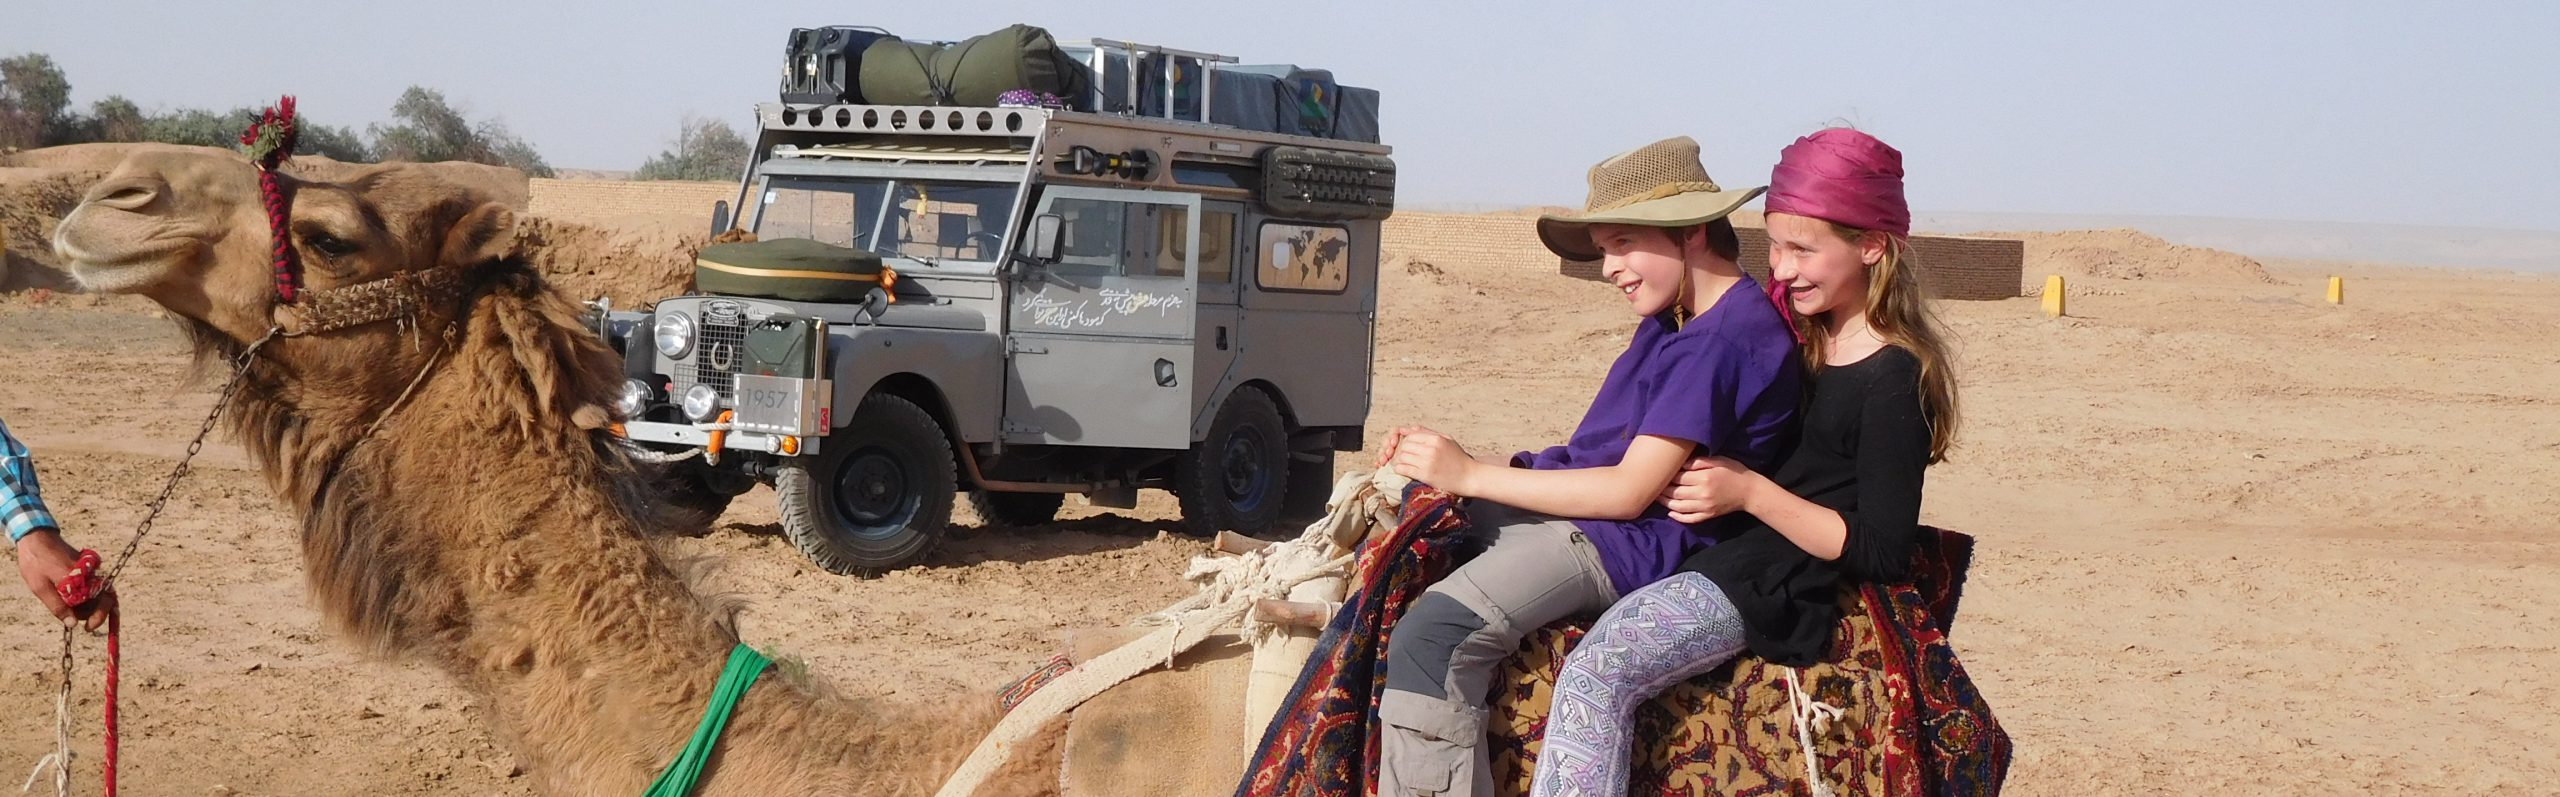 Retro Road Trip, Adventures in a Series 1 Land Rover